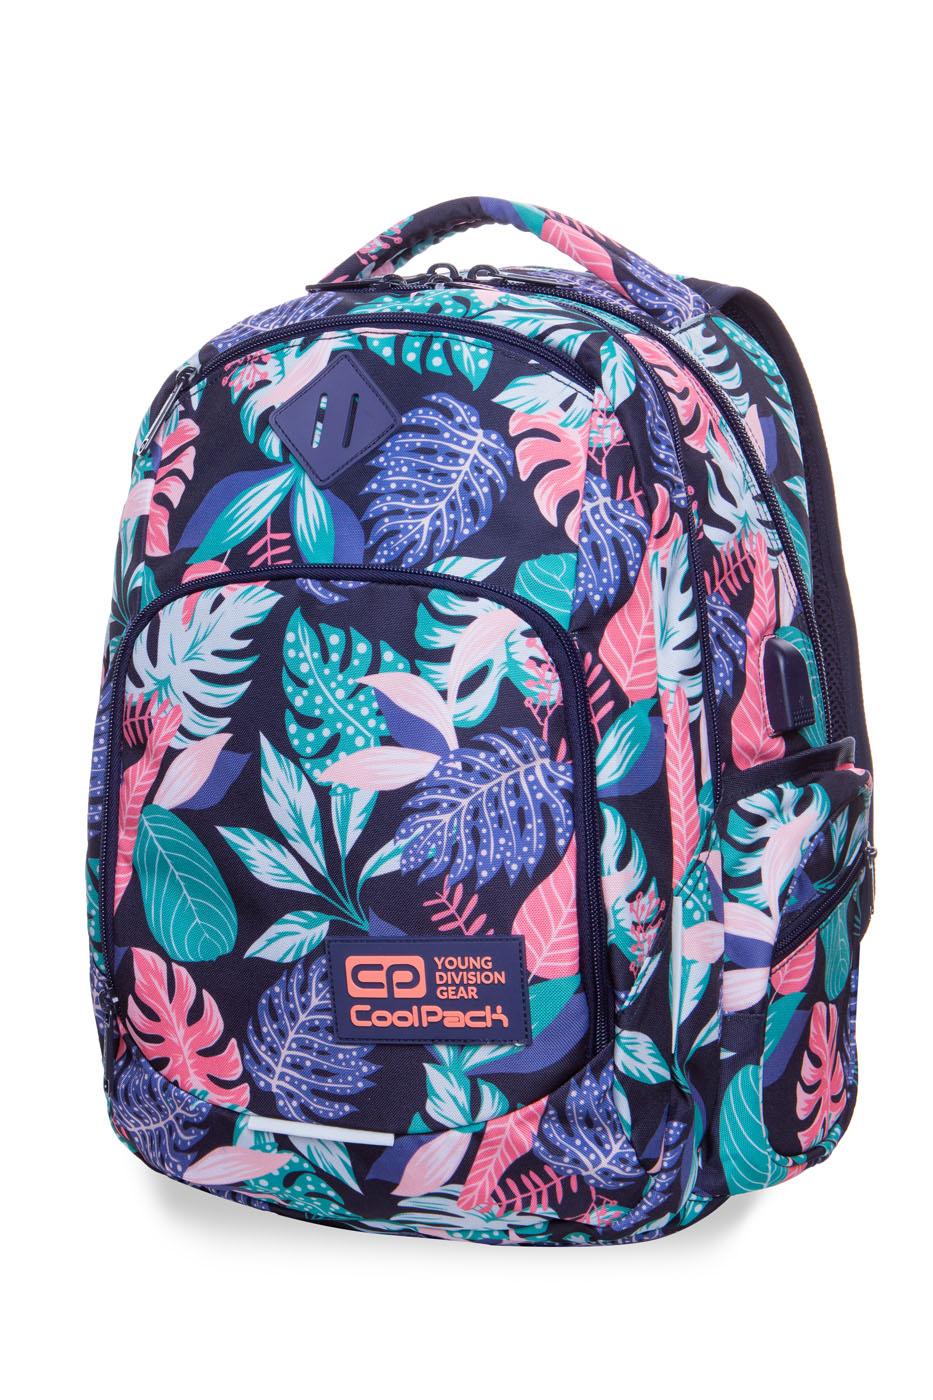 Coolpack   break  rygsæk   tropical mist